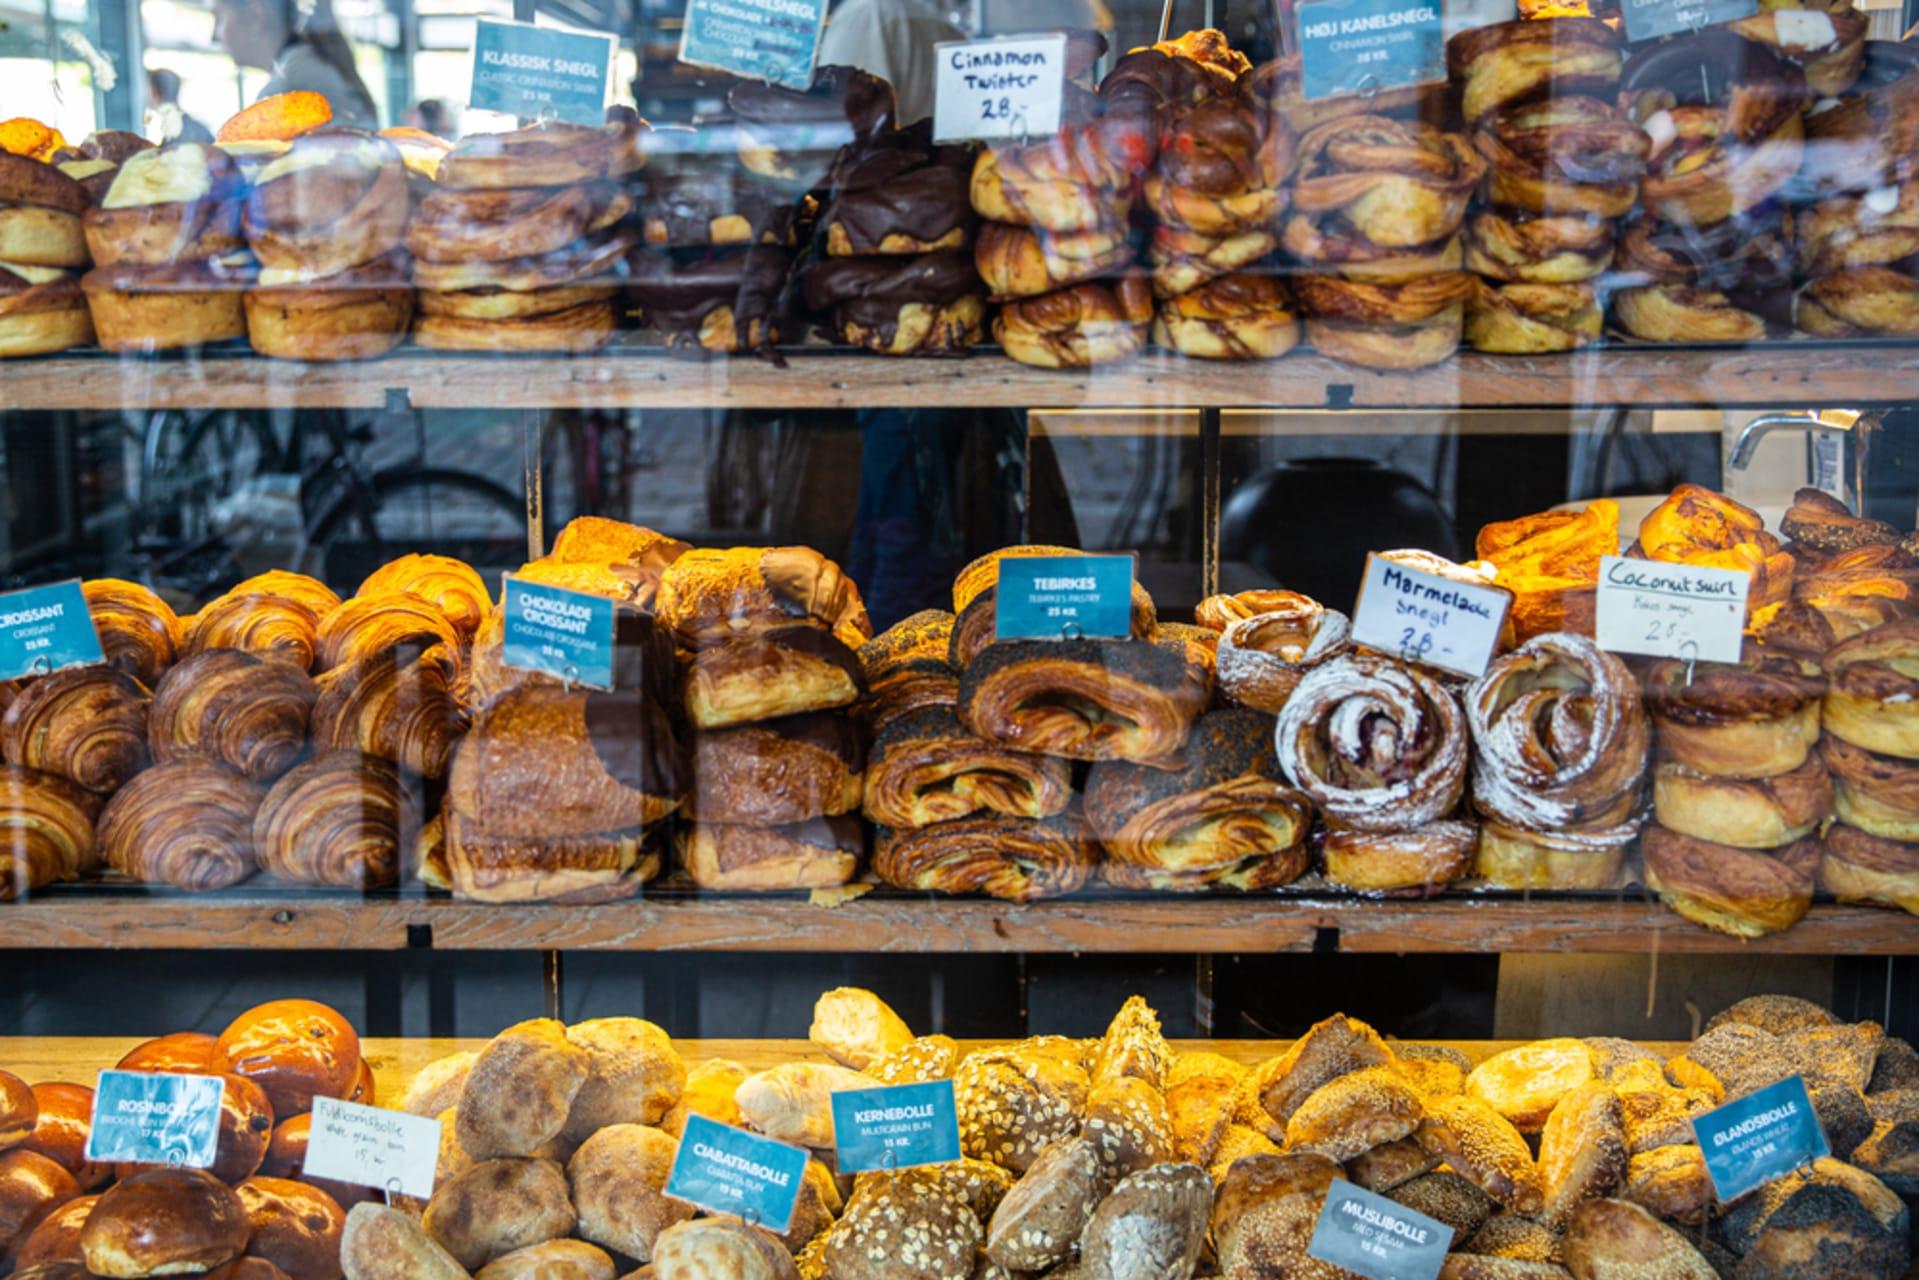 Copenhagen - Mystery Tour and Danish Pastries